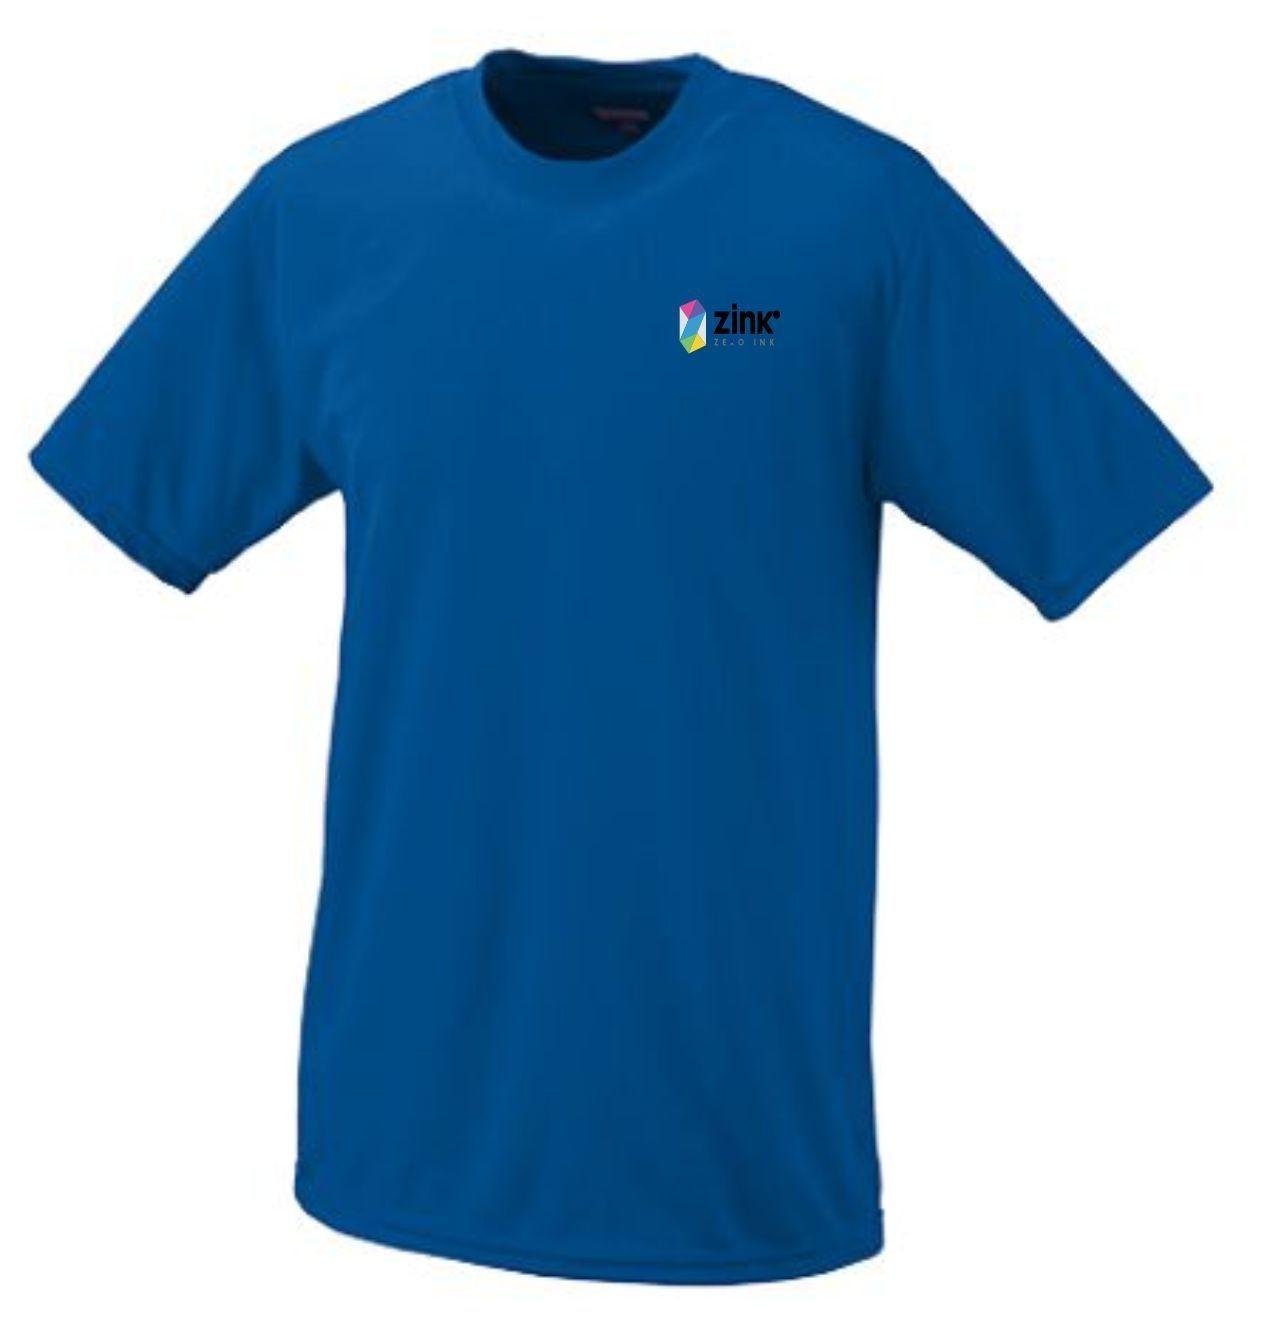 Augusta 790 Short Sleeve 100% Polyester Shirt